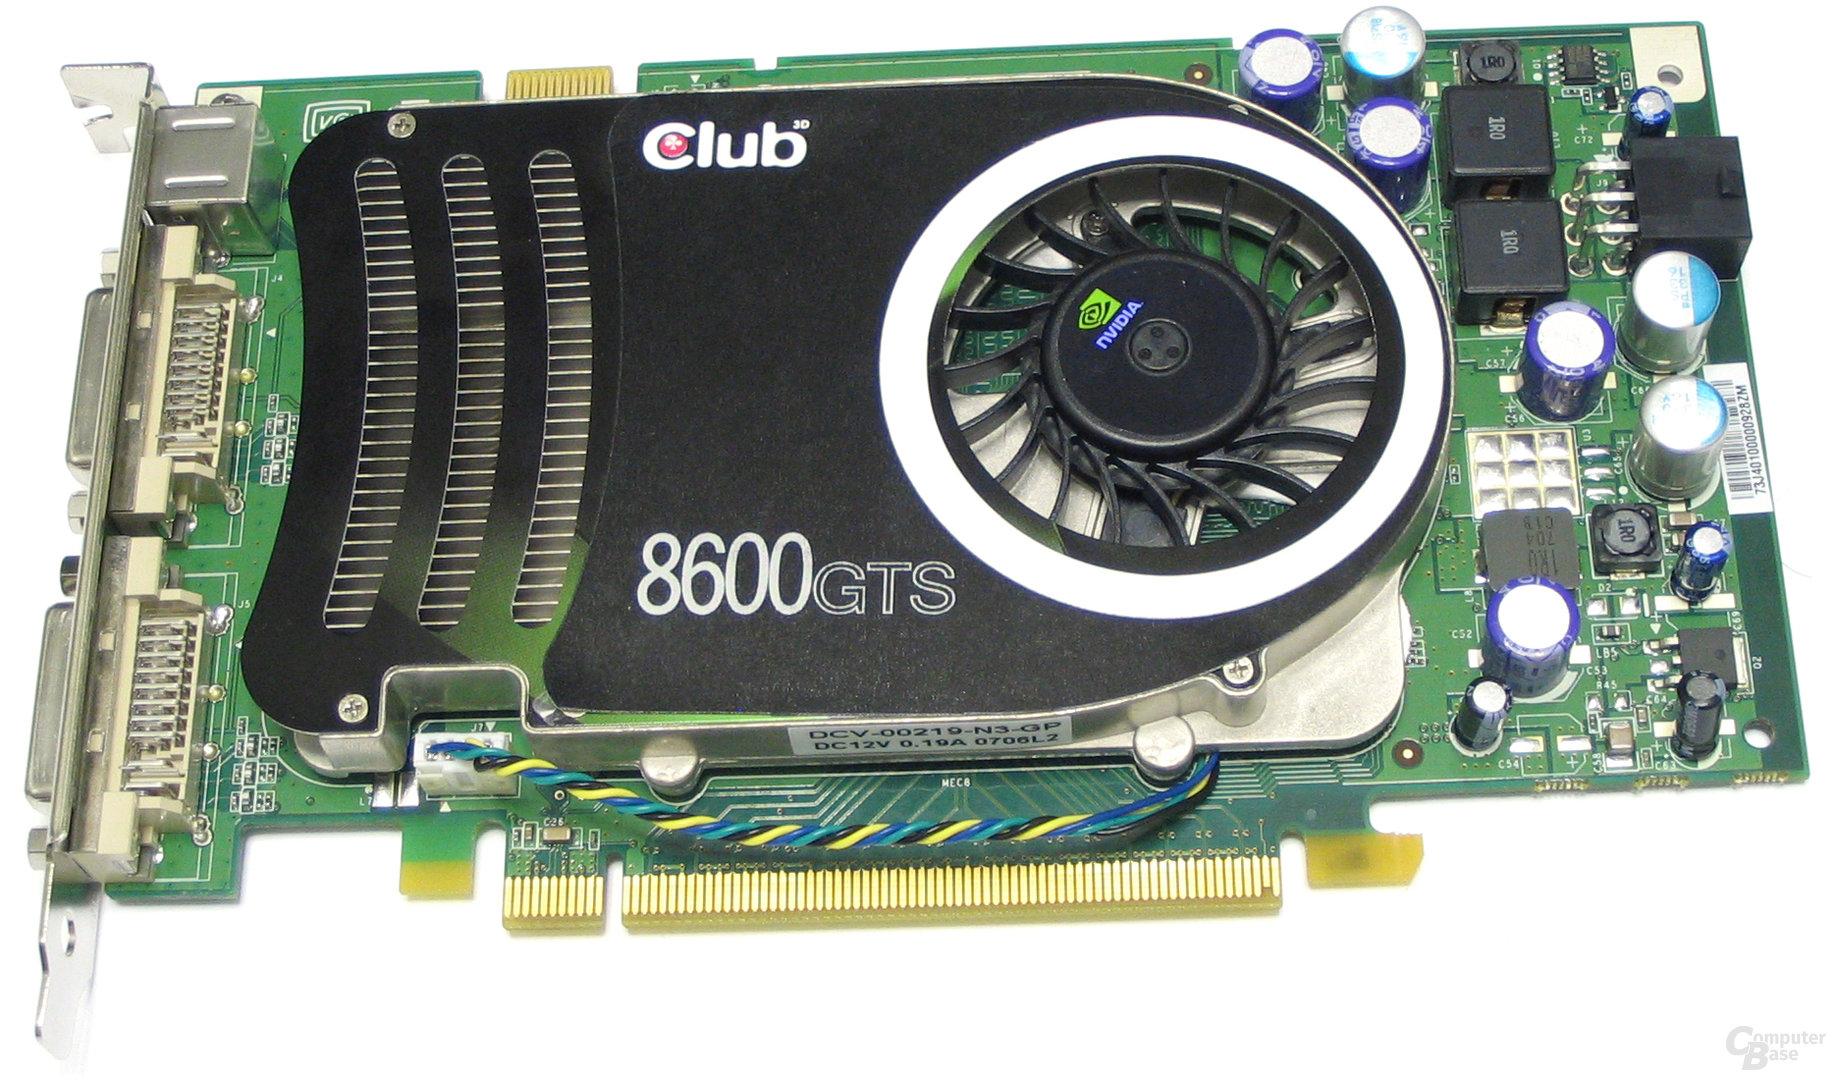 Club3D GeForce 8600 GTS